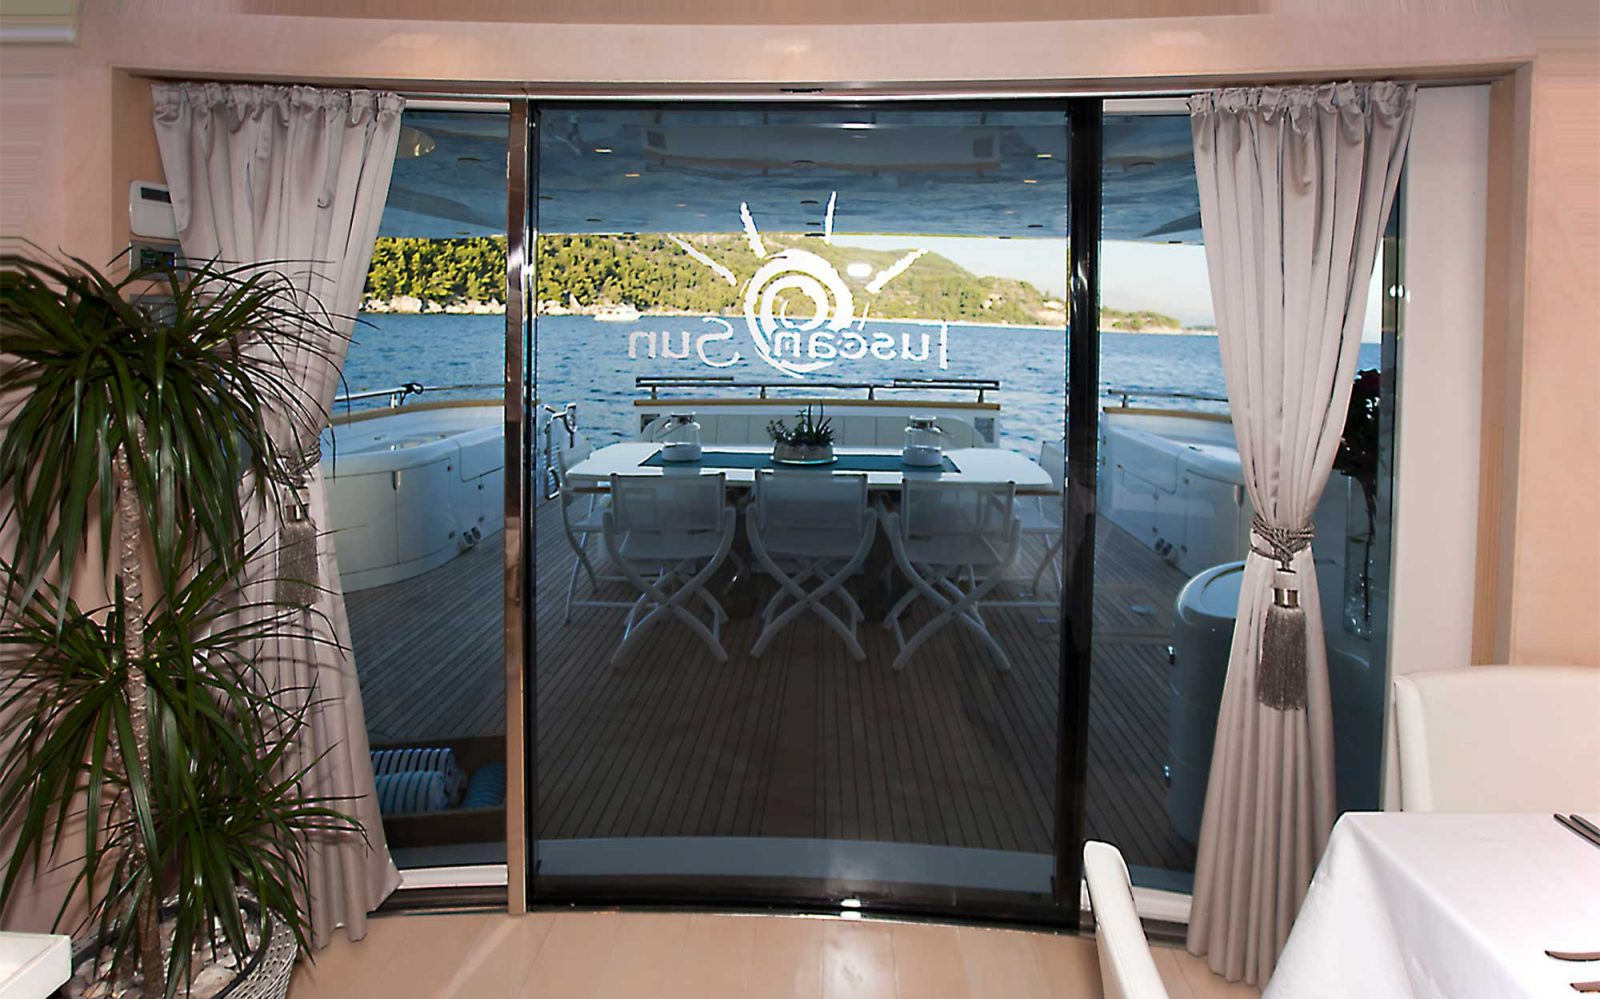 TUSCAN SUN salon view towards exit | TUSCAN SUN